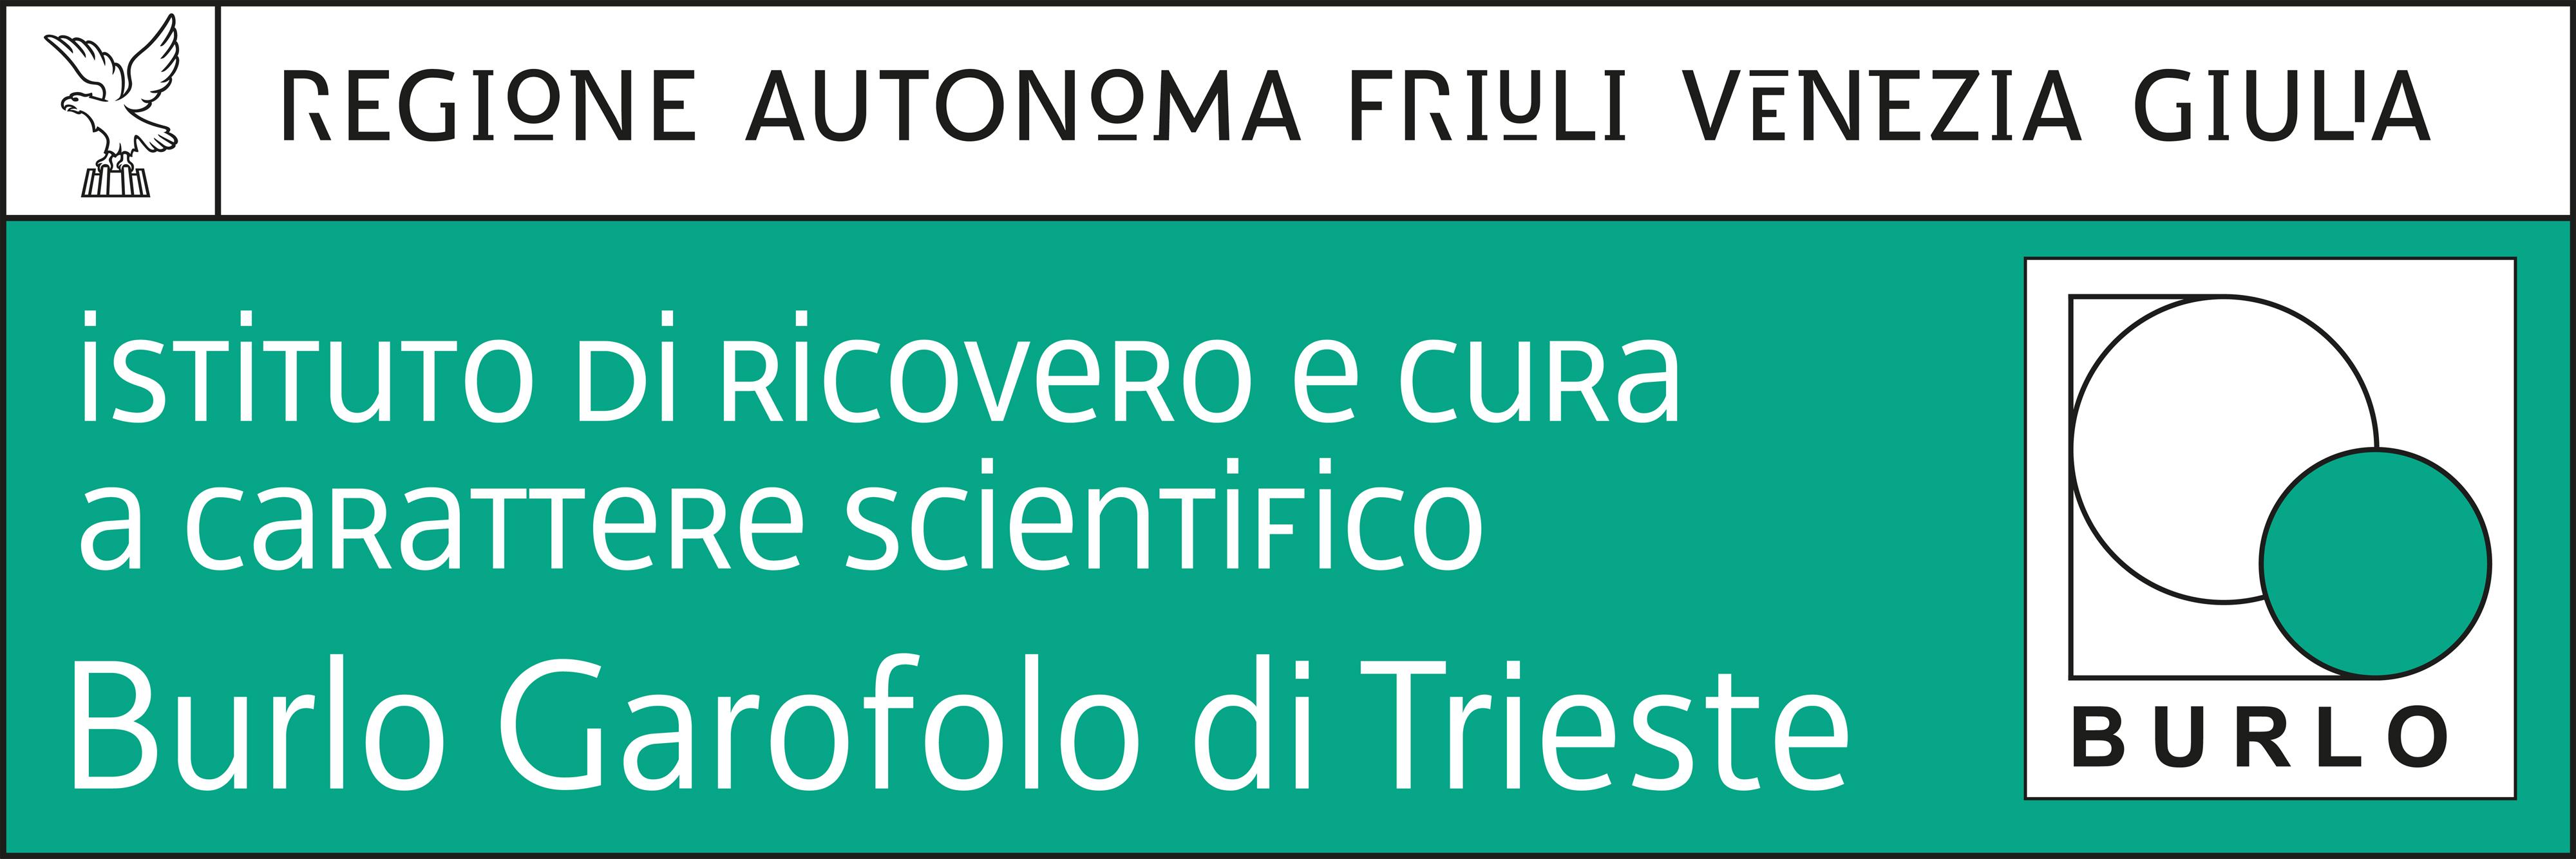 Logo Burlo Garofolo di Trieste